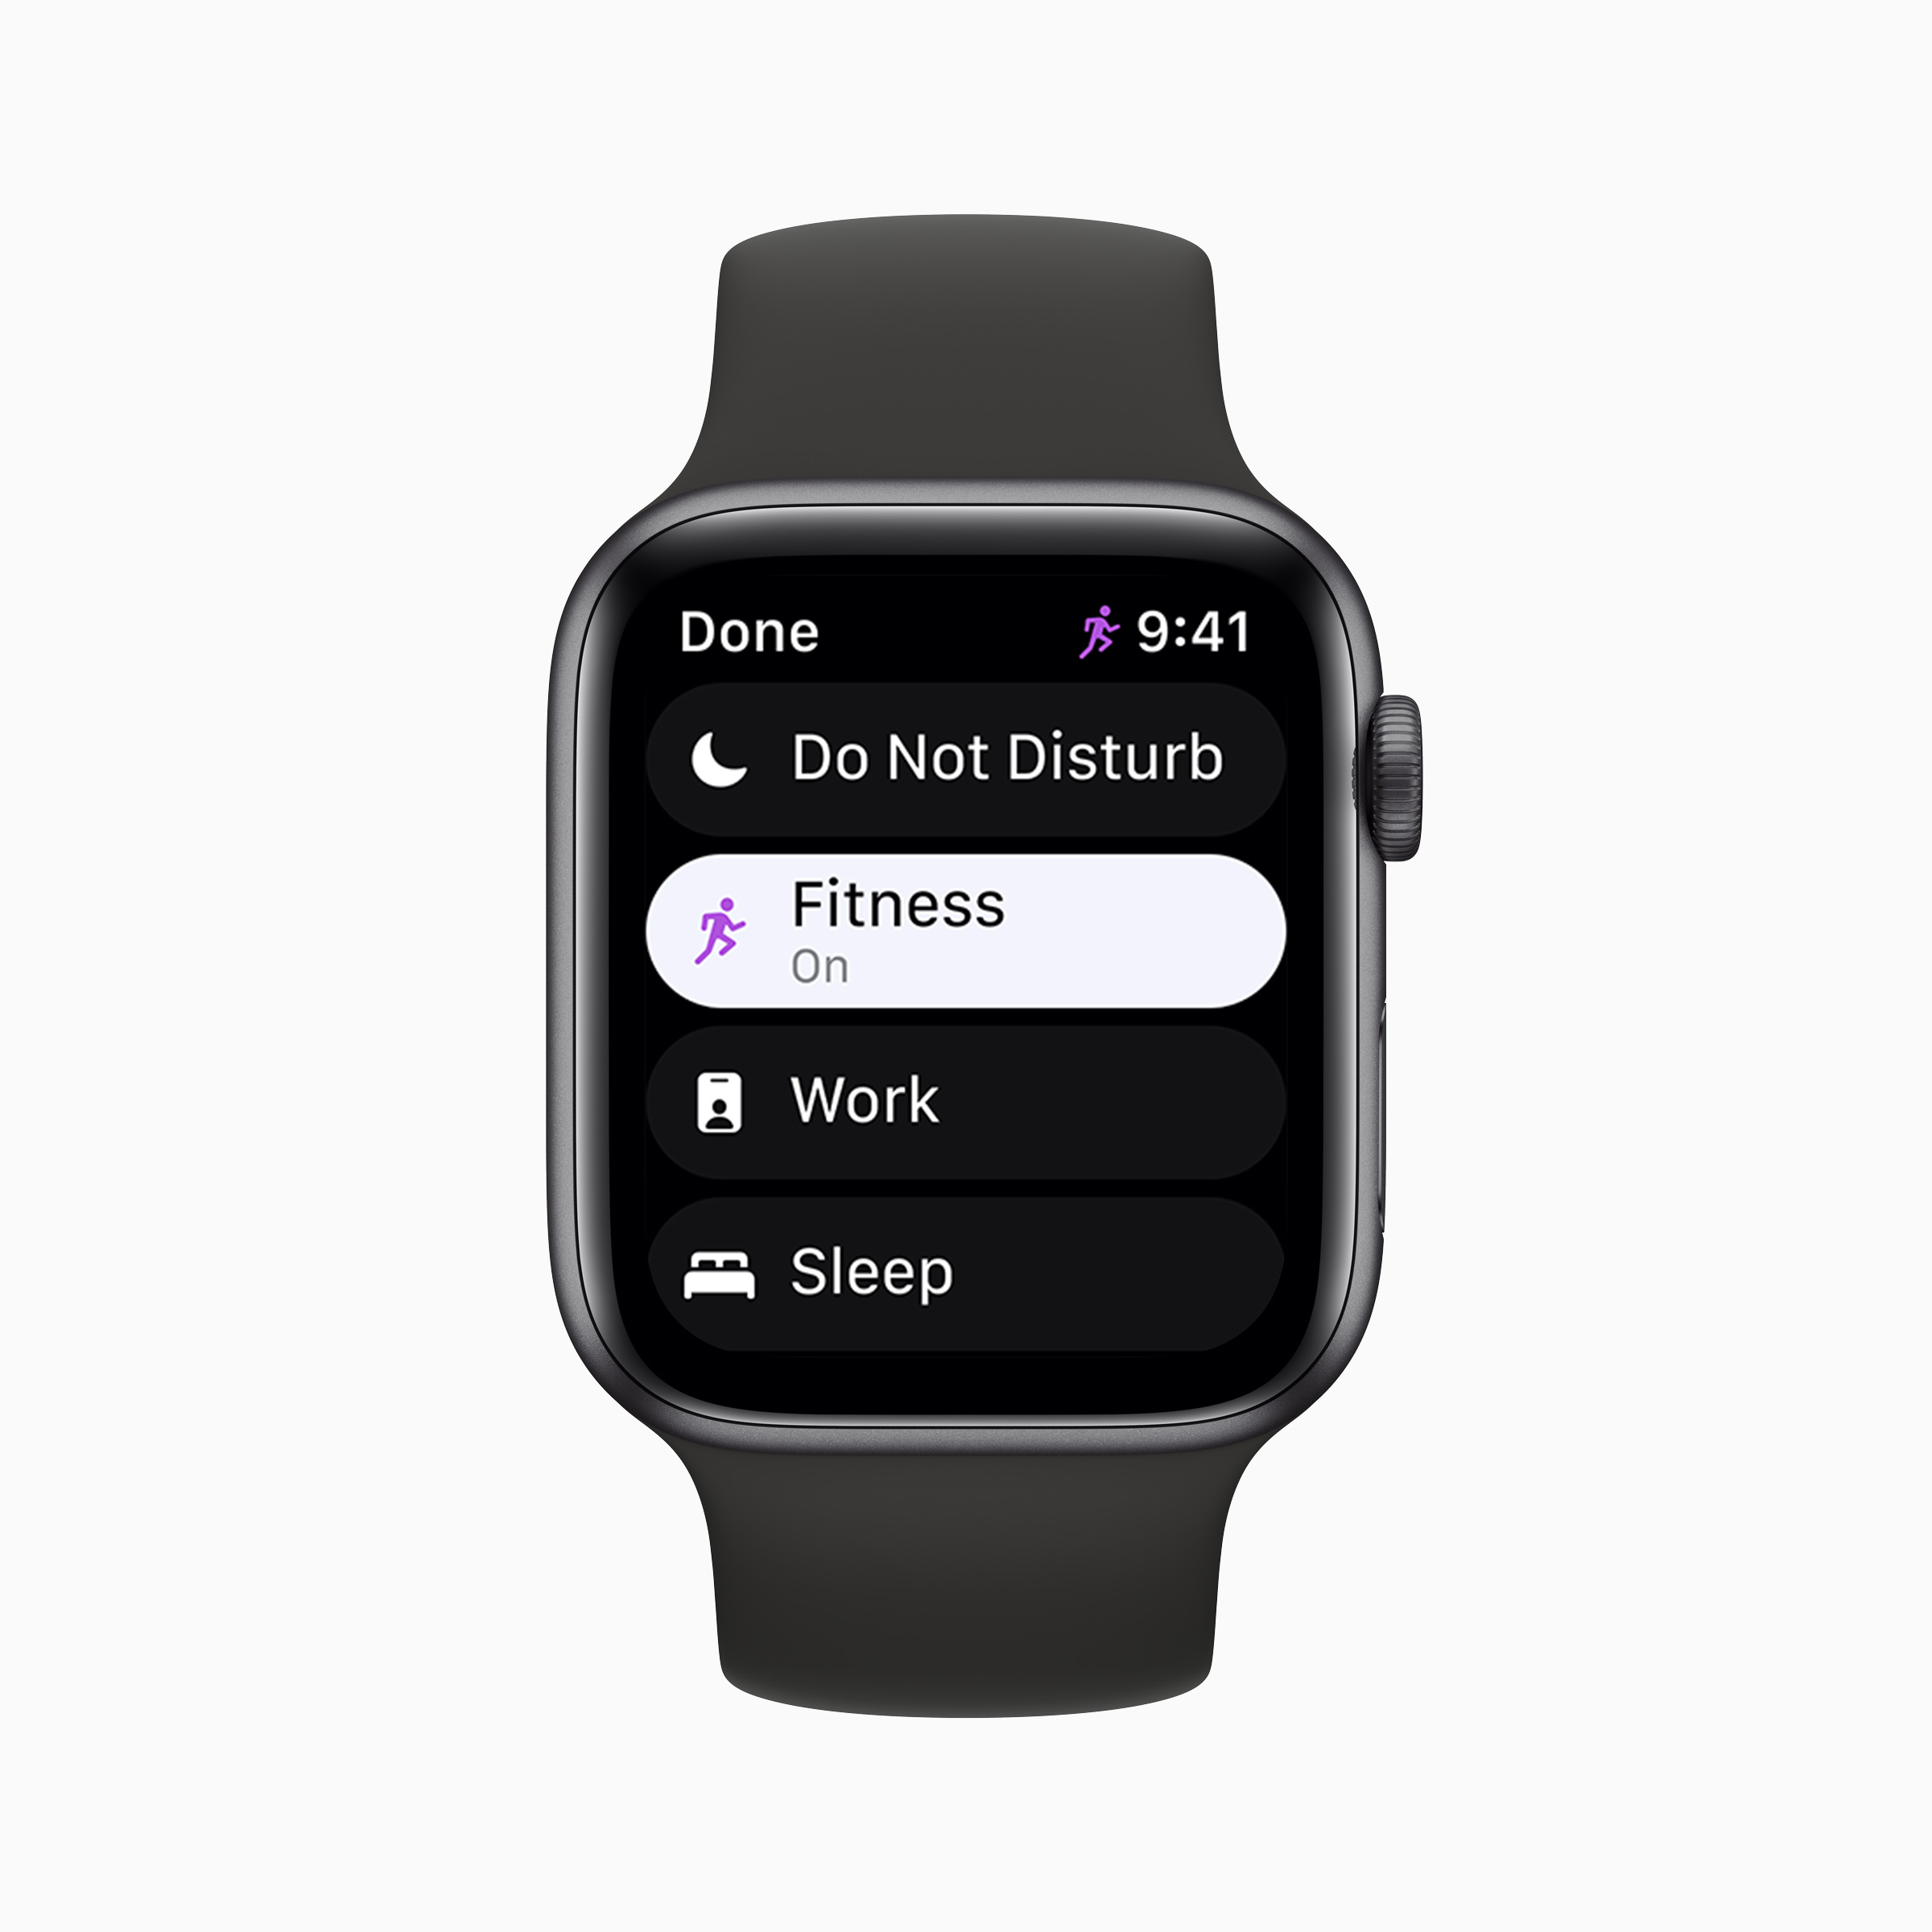 Apple Watch watchOS 8 Focus